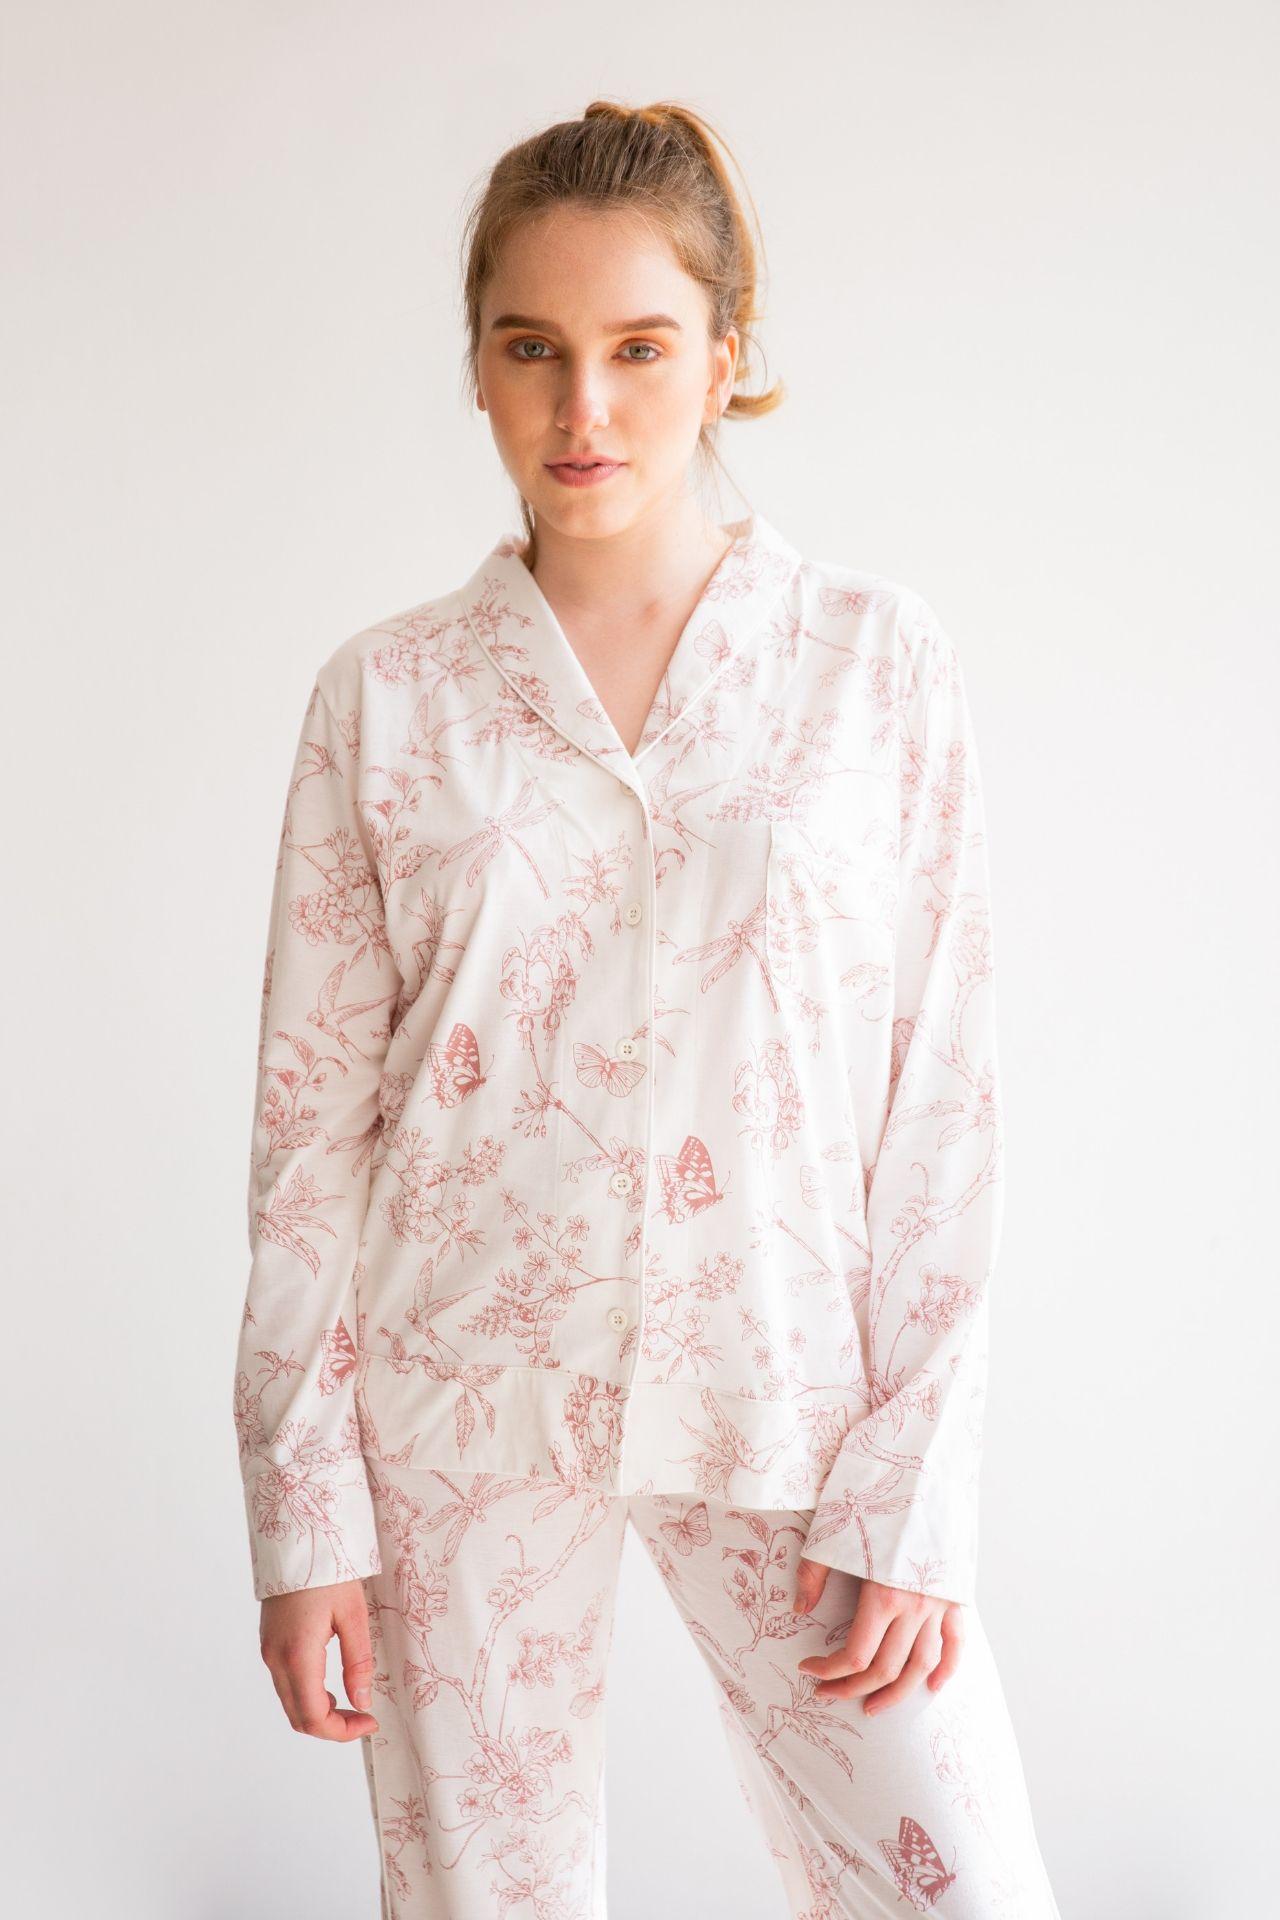 Pijama de algodón de 2 piezas pantalón y camisero manga larga ROSA.